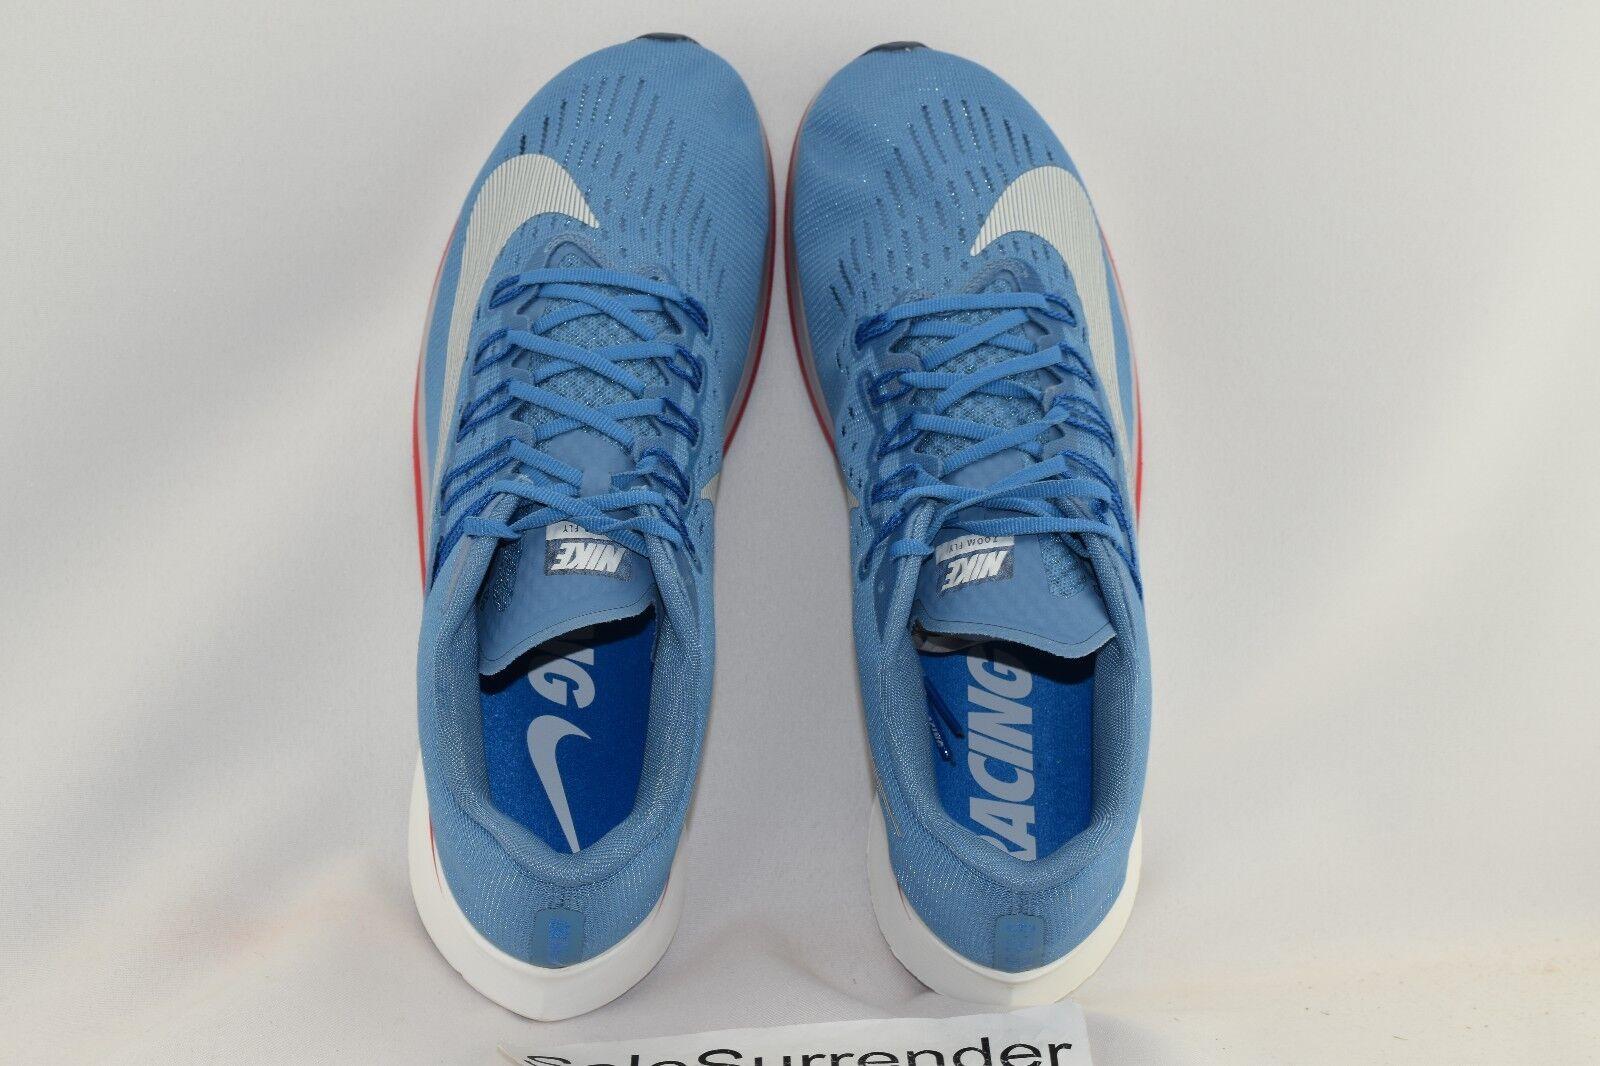 Nike zoom fly - 8 - nuovo - 880848-402 880848-402 880848-402 egeo tempesta bianco rosso blu street 40c33d